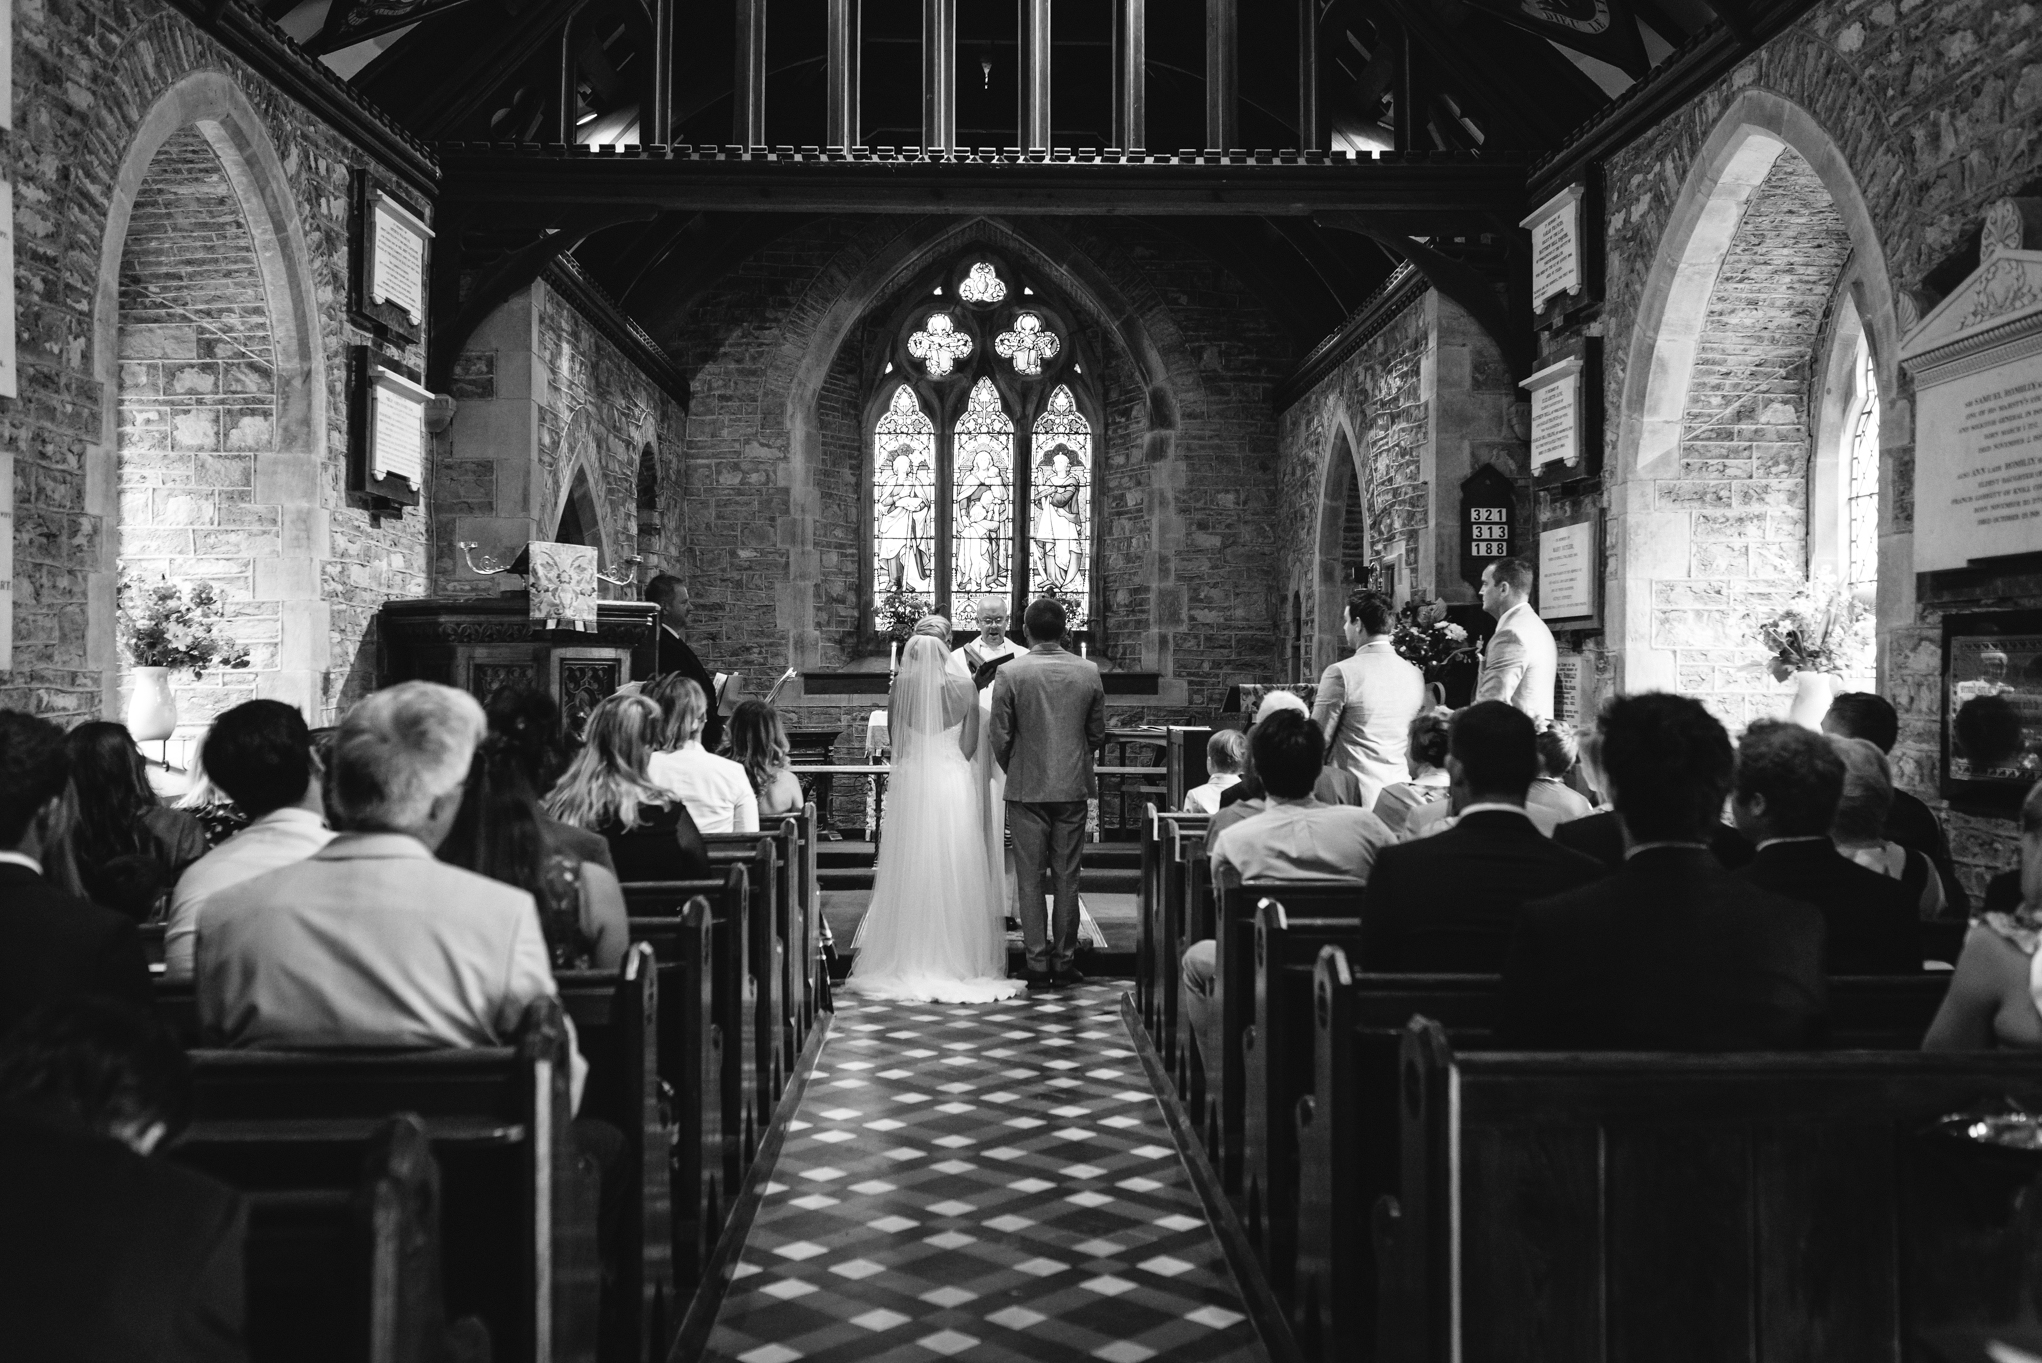 Copy of Church Wedding Ceremony